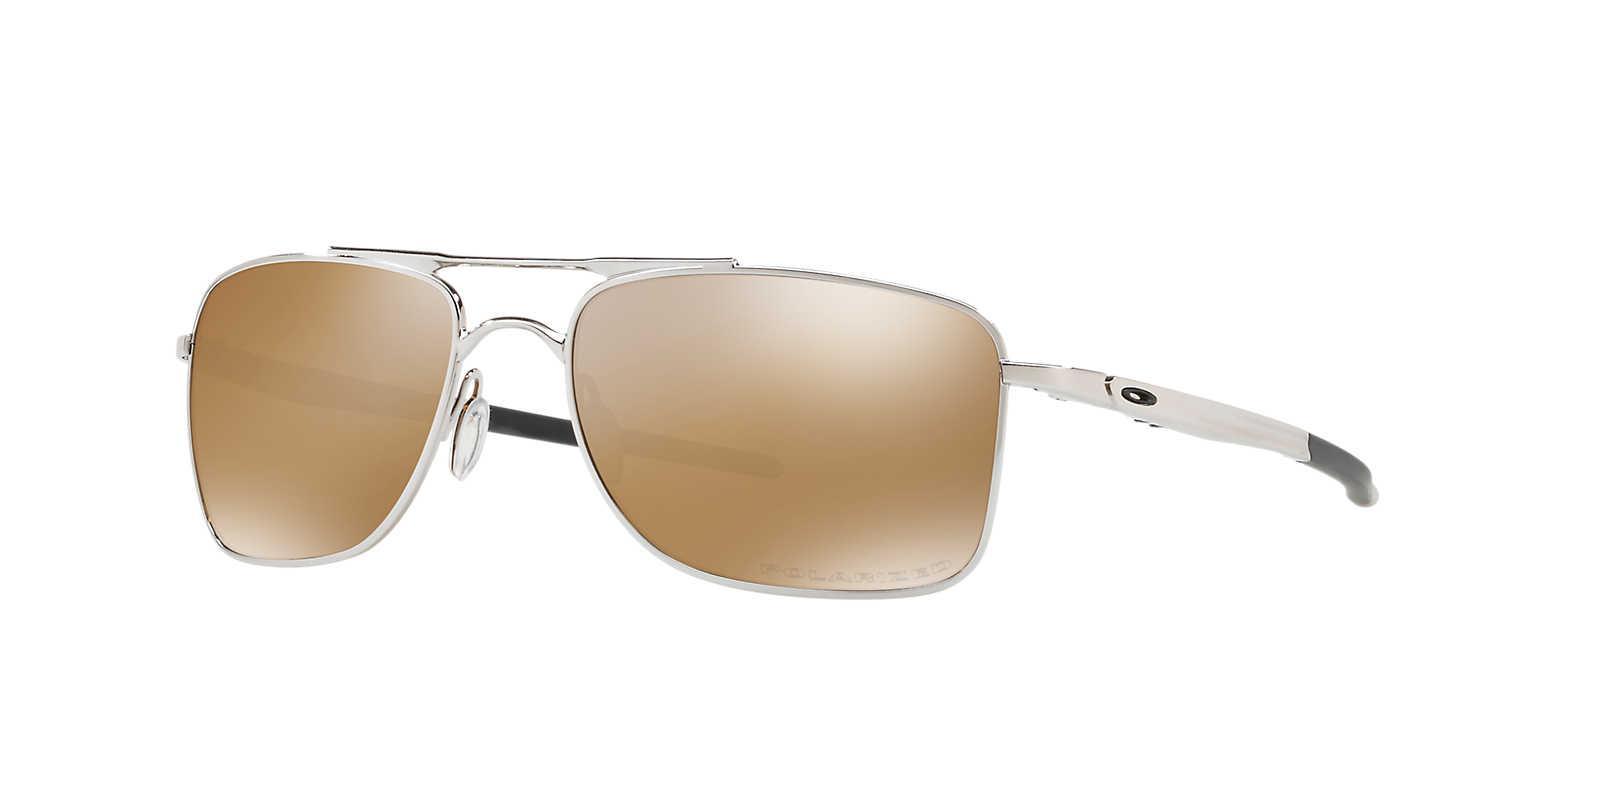 9078a7fd20 Oakley Sunglass Oo4124 62 Gauge 8 in Brown for Men - Save 30.0% - Lyst